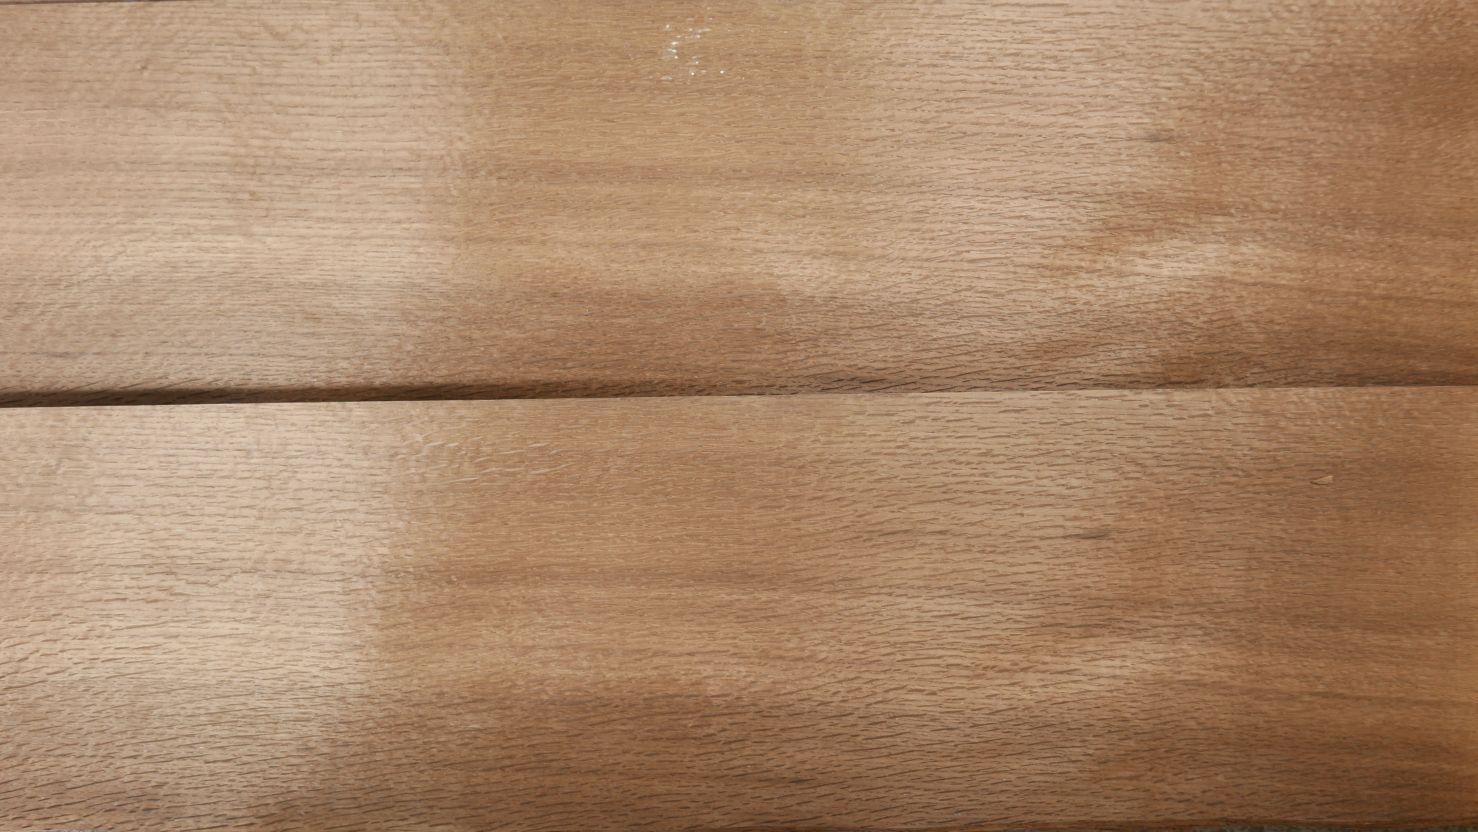 A0249x-4 Europees Goudbruin Gerookt Eiken Gespiegeld 23,5-25,5x275cm 24st